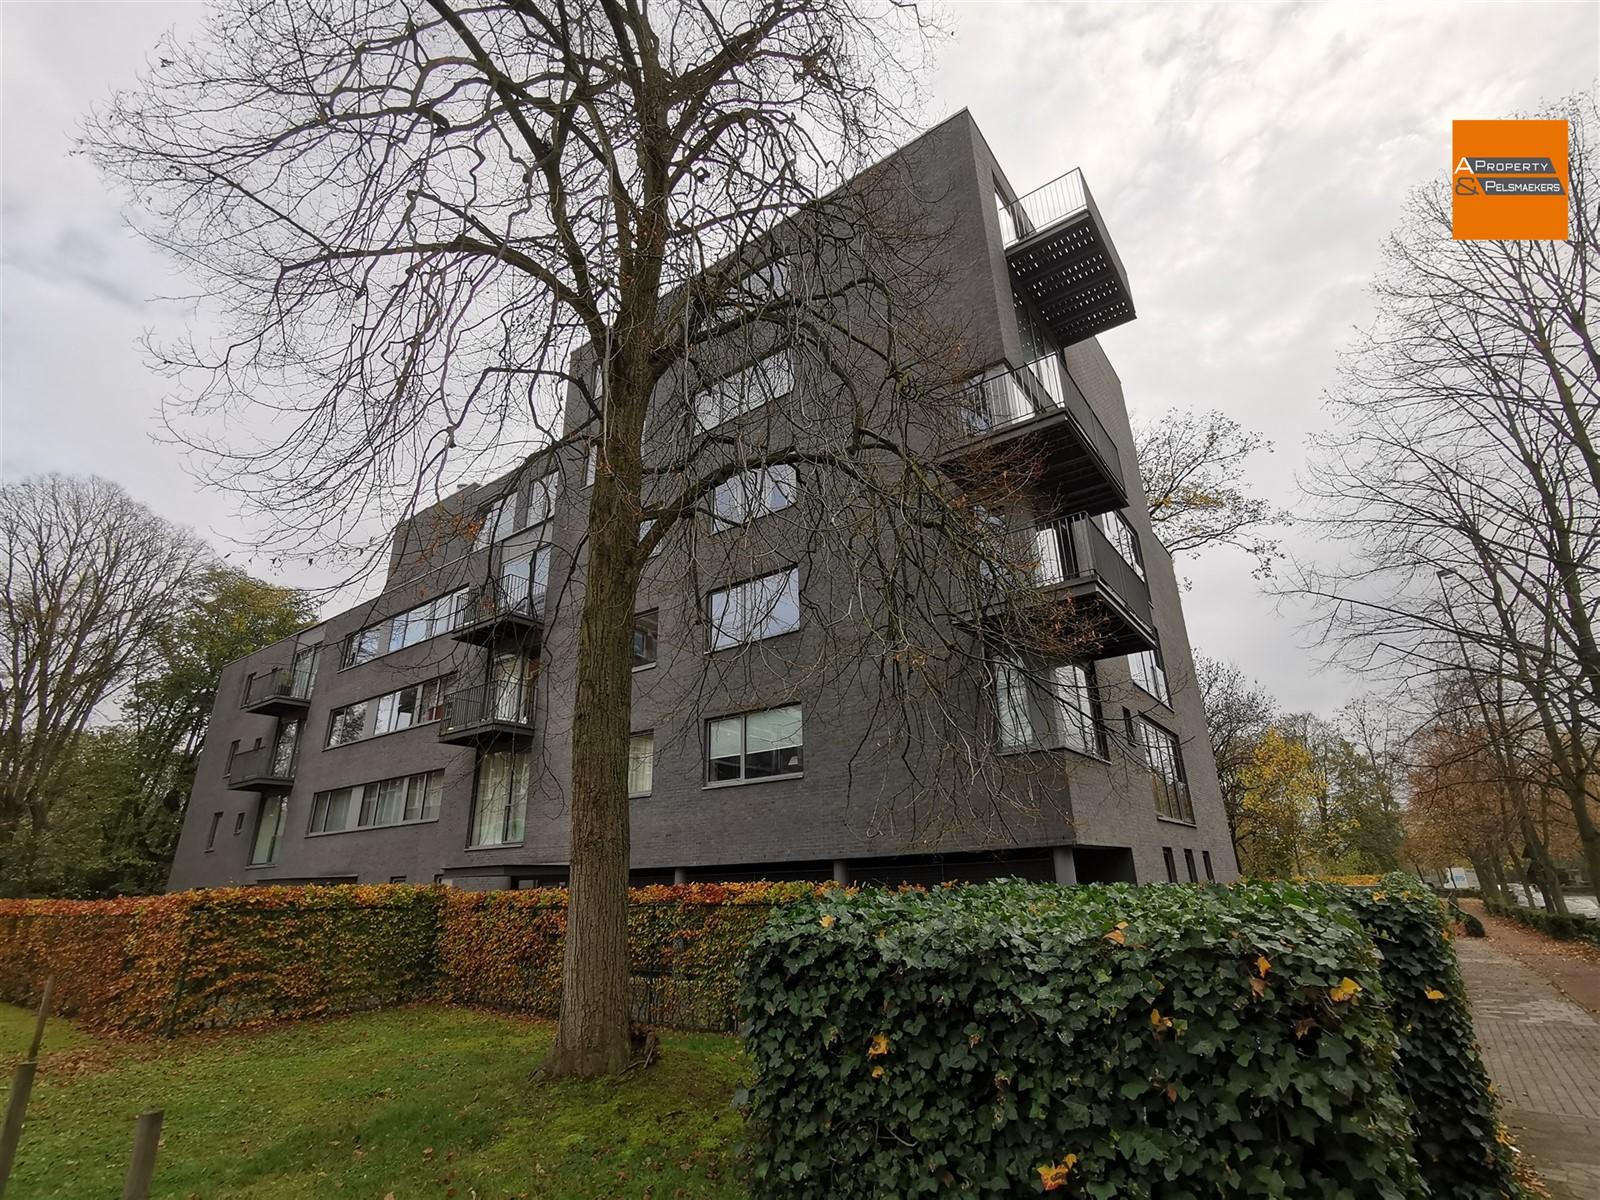 Foto 19 : Gemeubeld appartement in 1050 ELSENE (België) - Prijs € 1.500